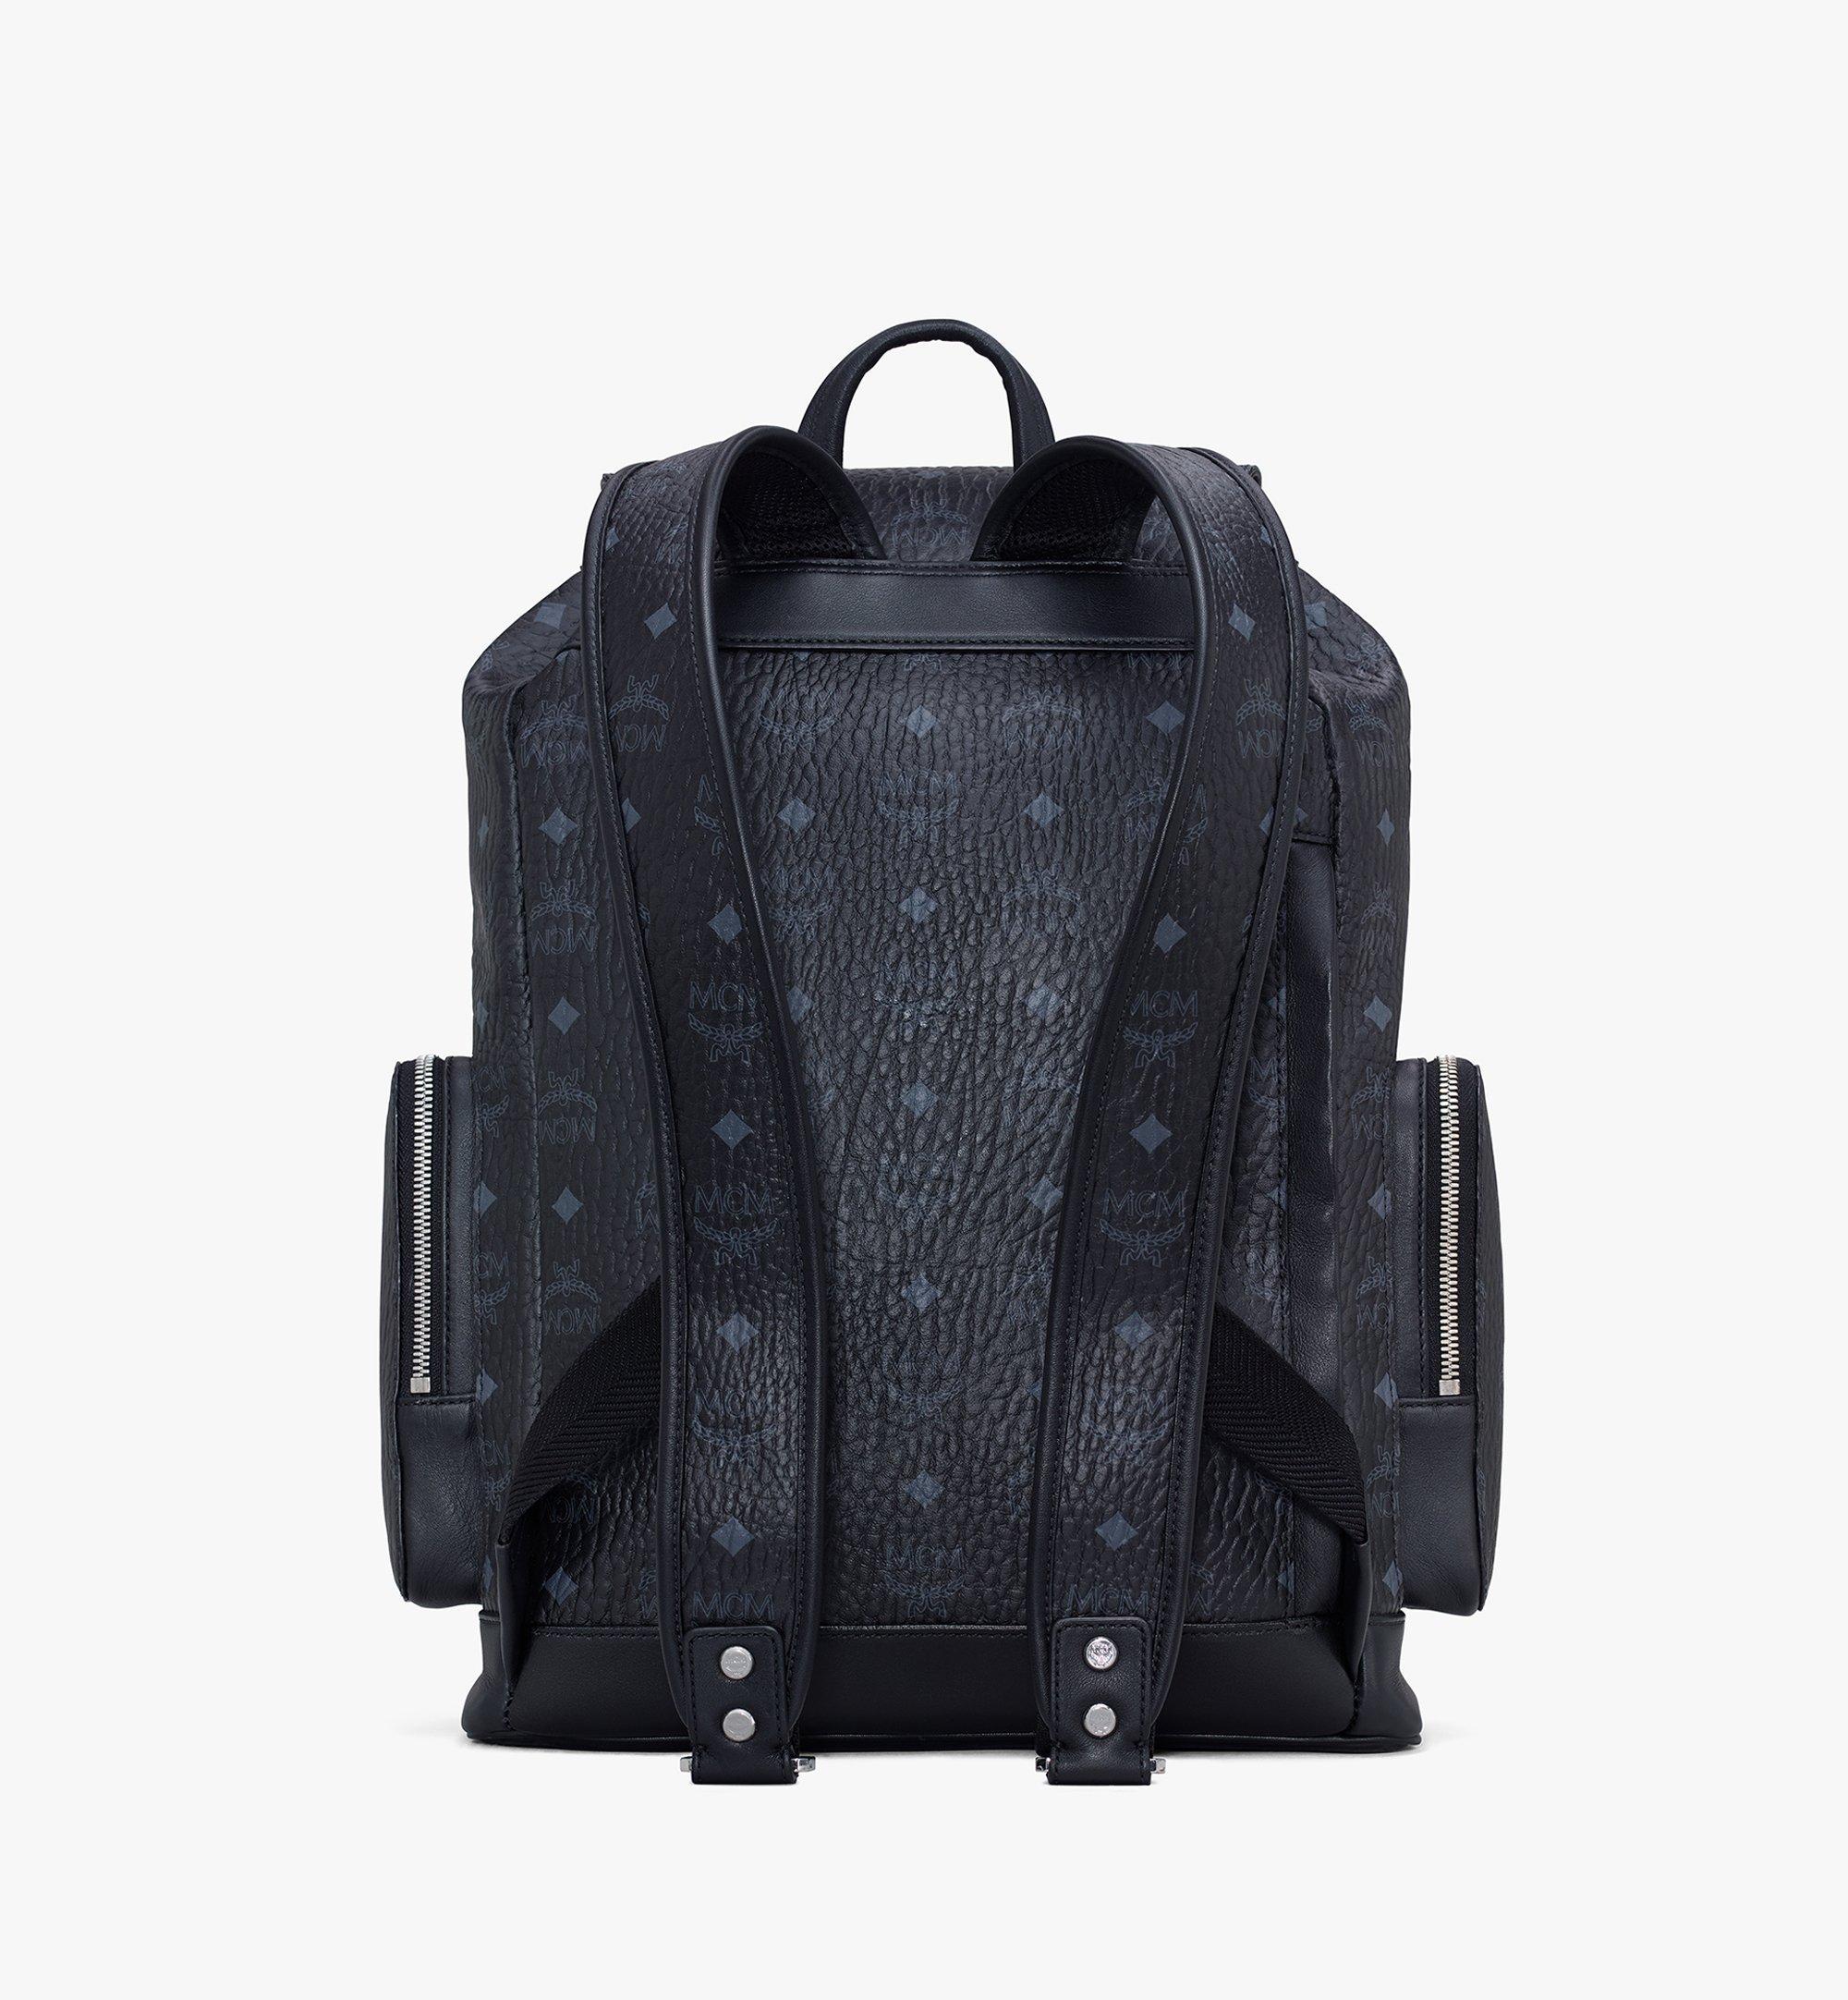 MCM Brandenburg Backpack in Visetos Black MMKASBG04BK001 Alternate View 3